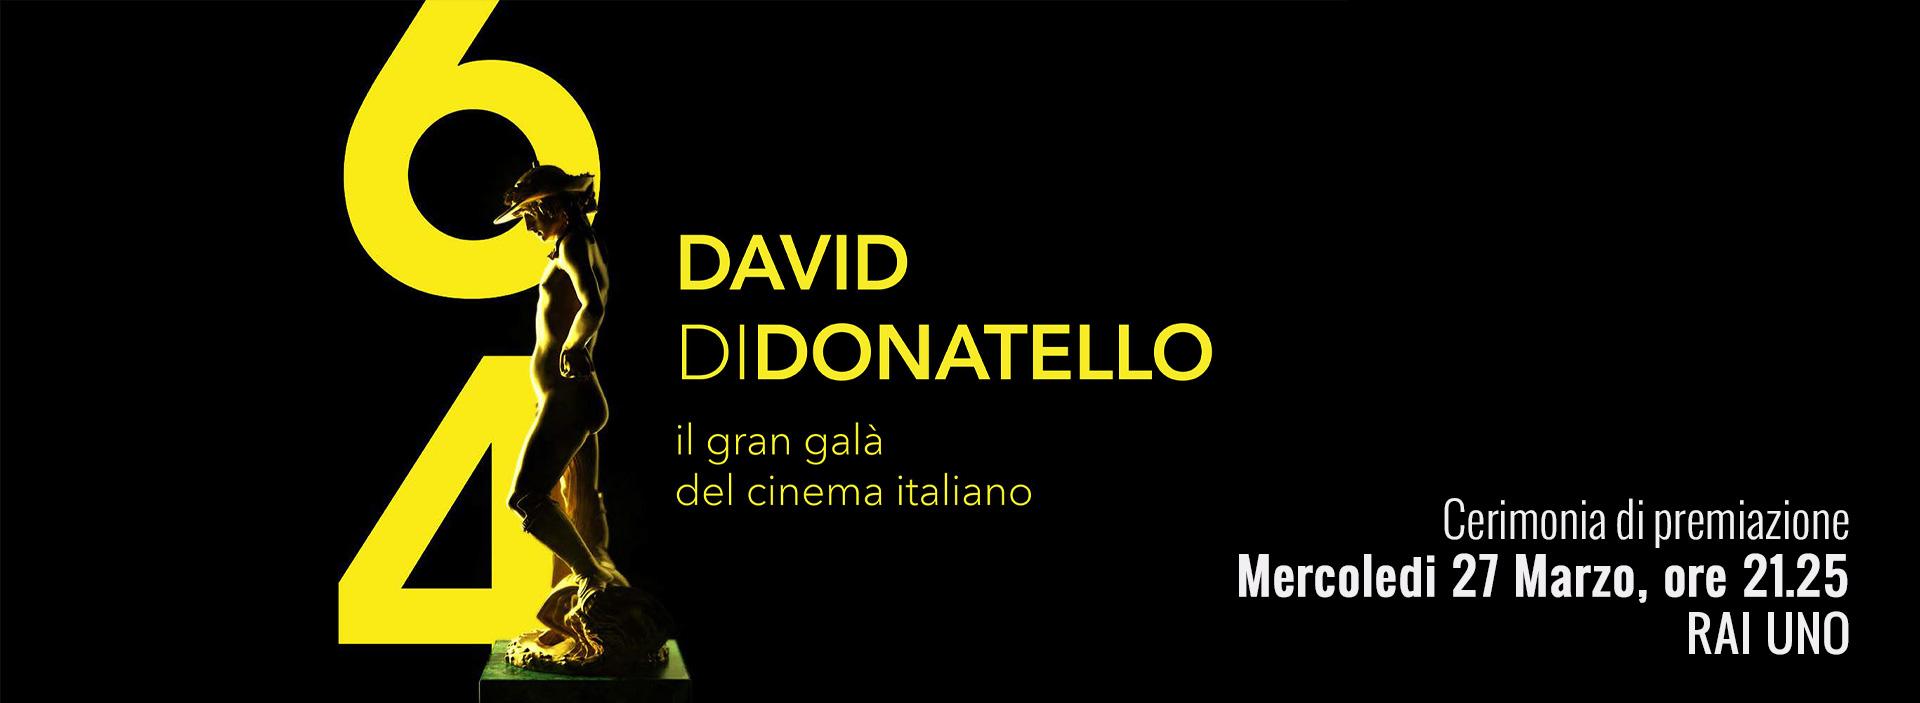 davidslide64